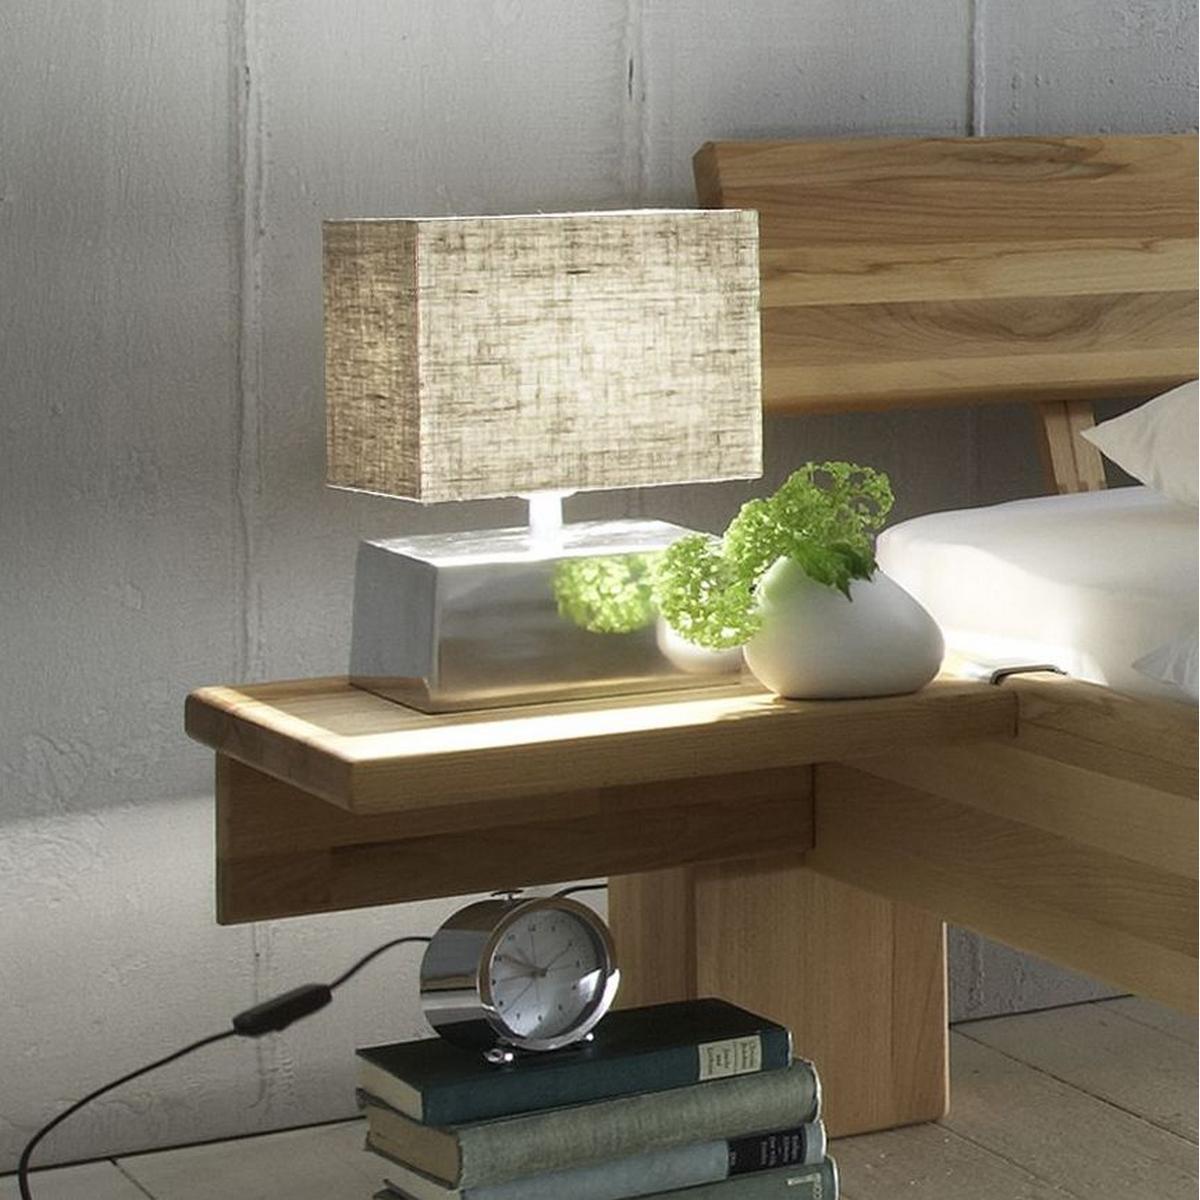 massivholz bett 100x200 xl easy sleep kernbuche massiv ge lt 9510 95 87. Black Bedroom Furniture Sets. Home Design Ideas